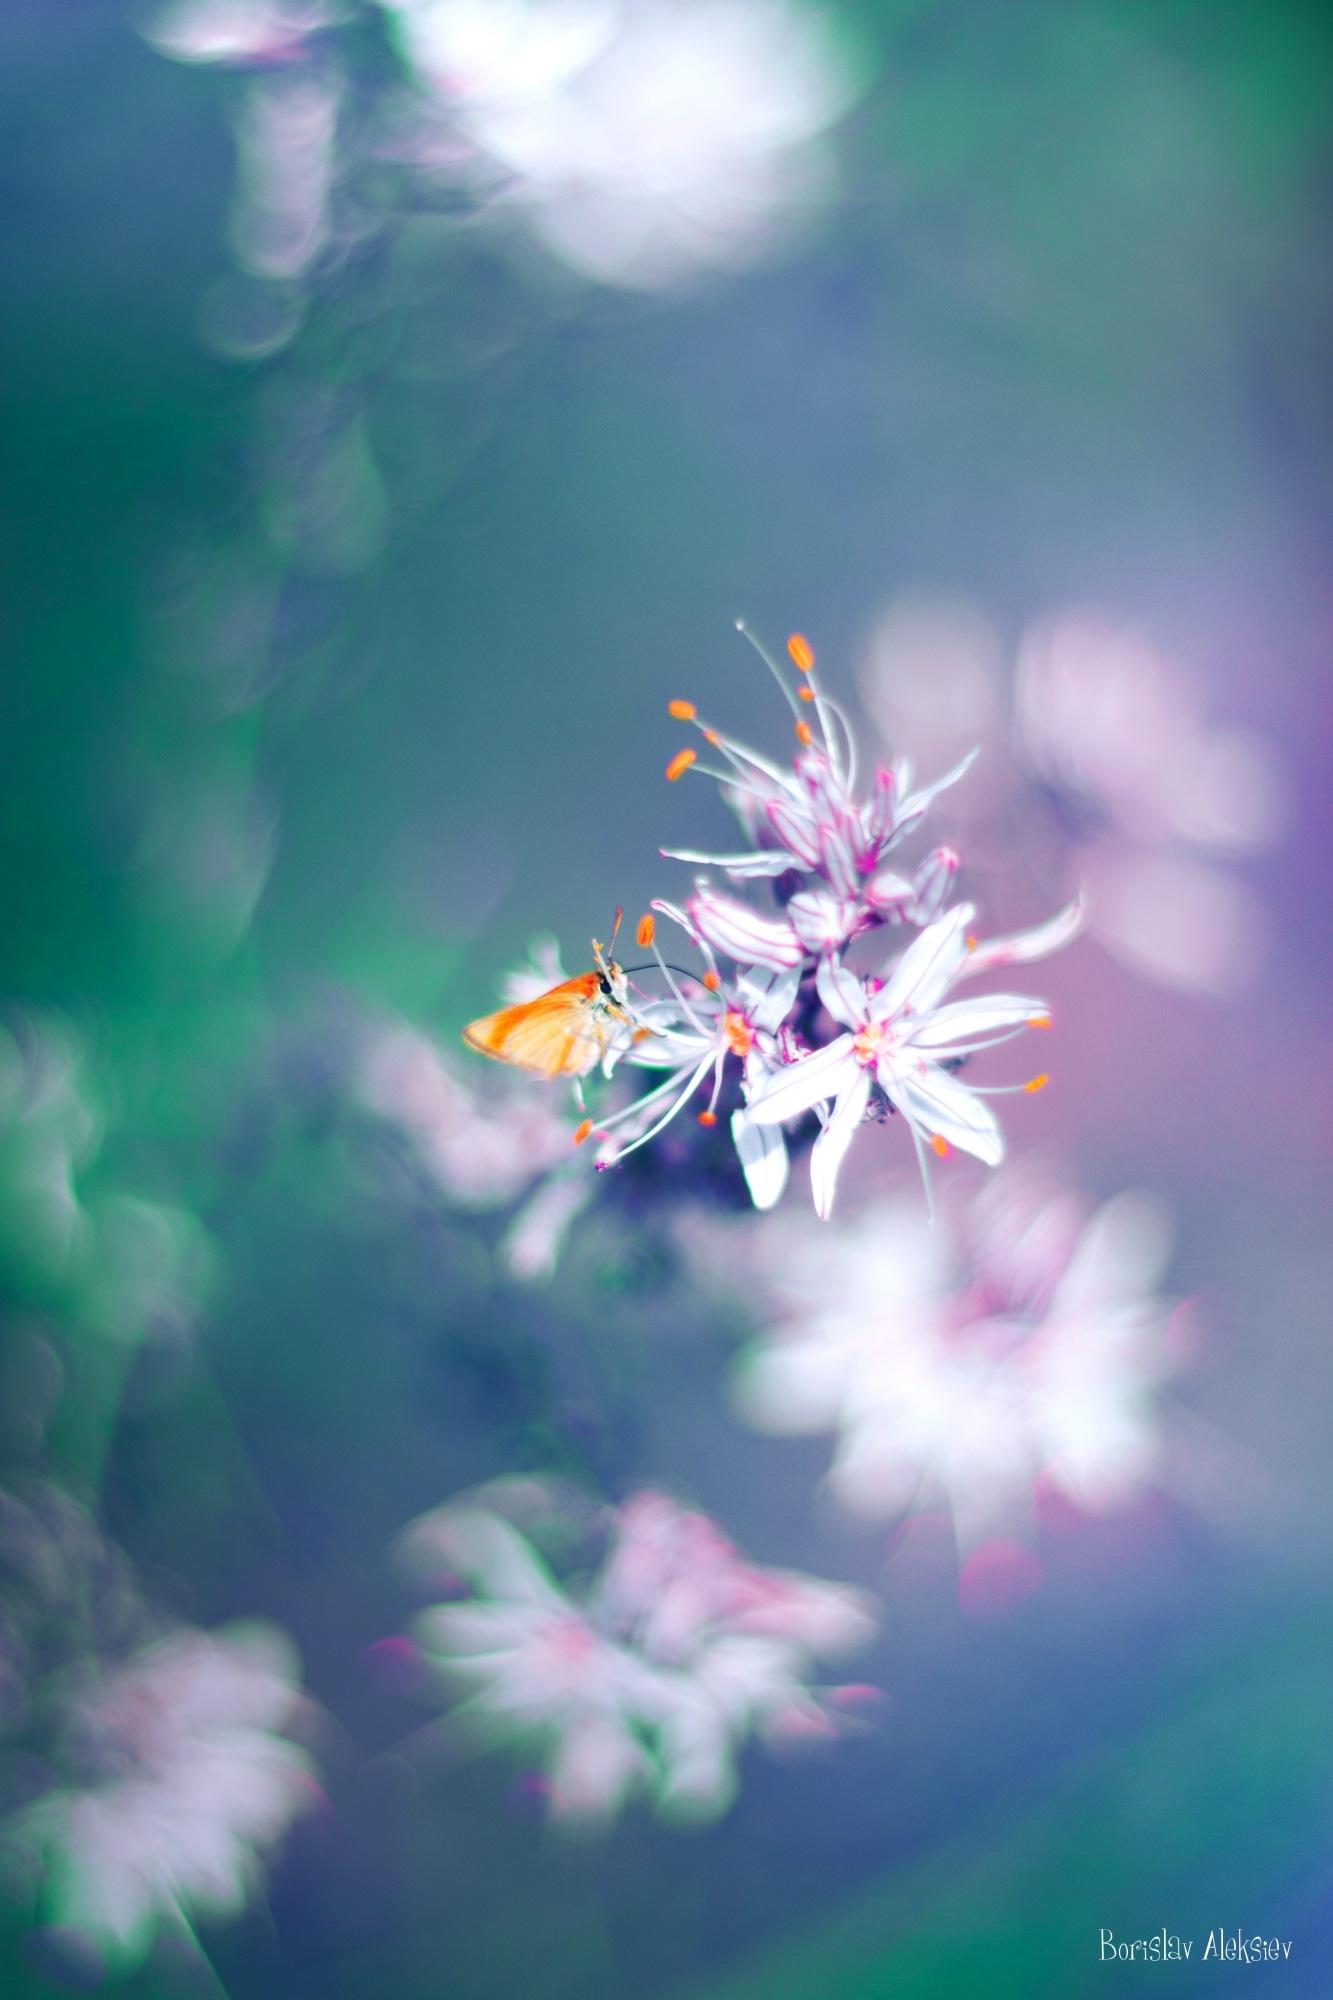 White,Blue and Green by Borislav Aleksiev